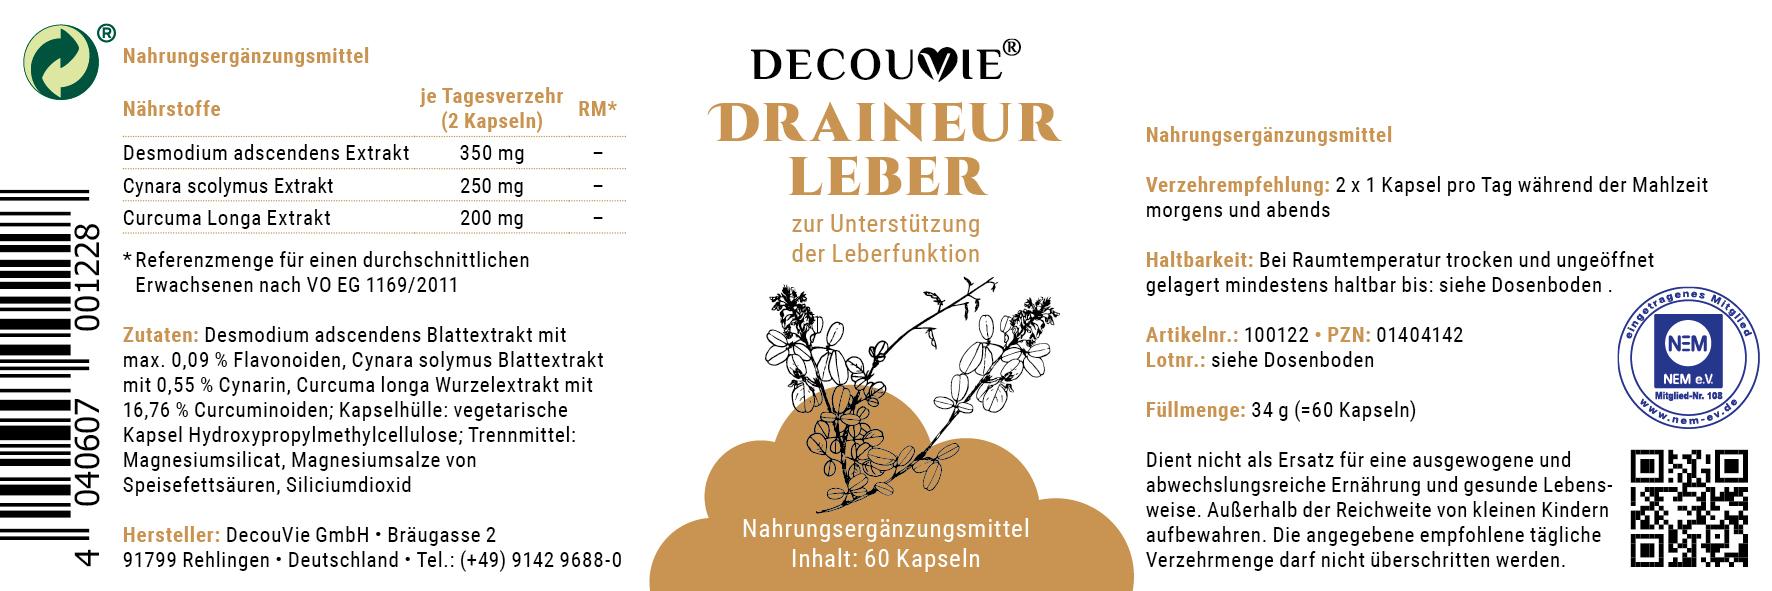 Draineur Leber, zur Unterstützung des Leberstoffwechsels, 60 Kapseln